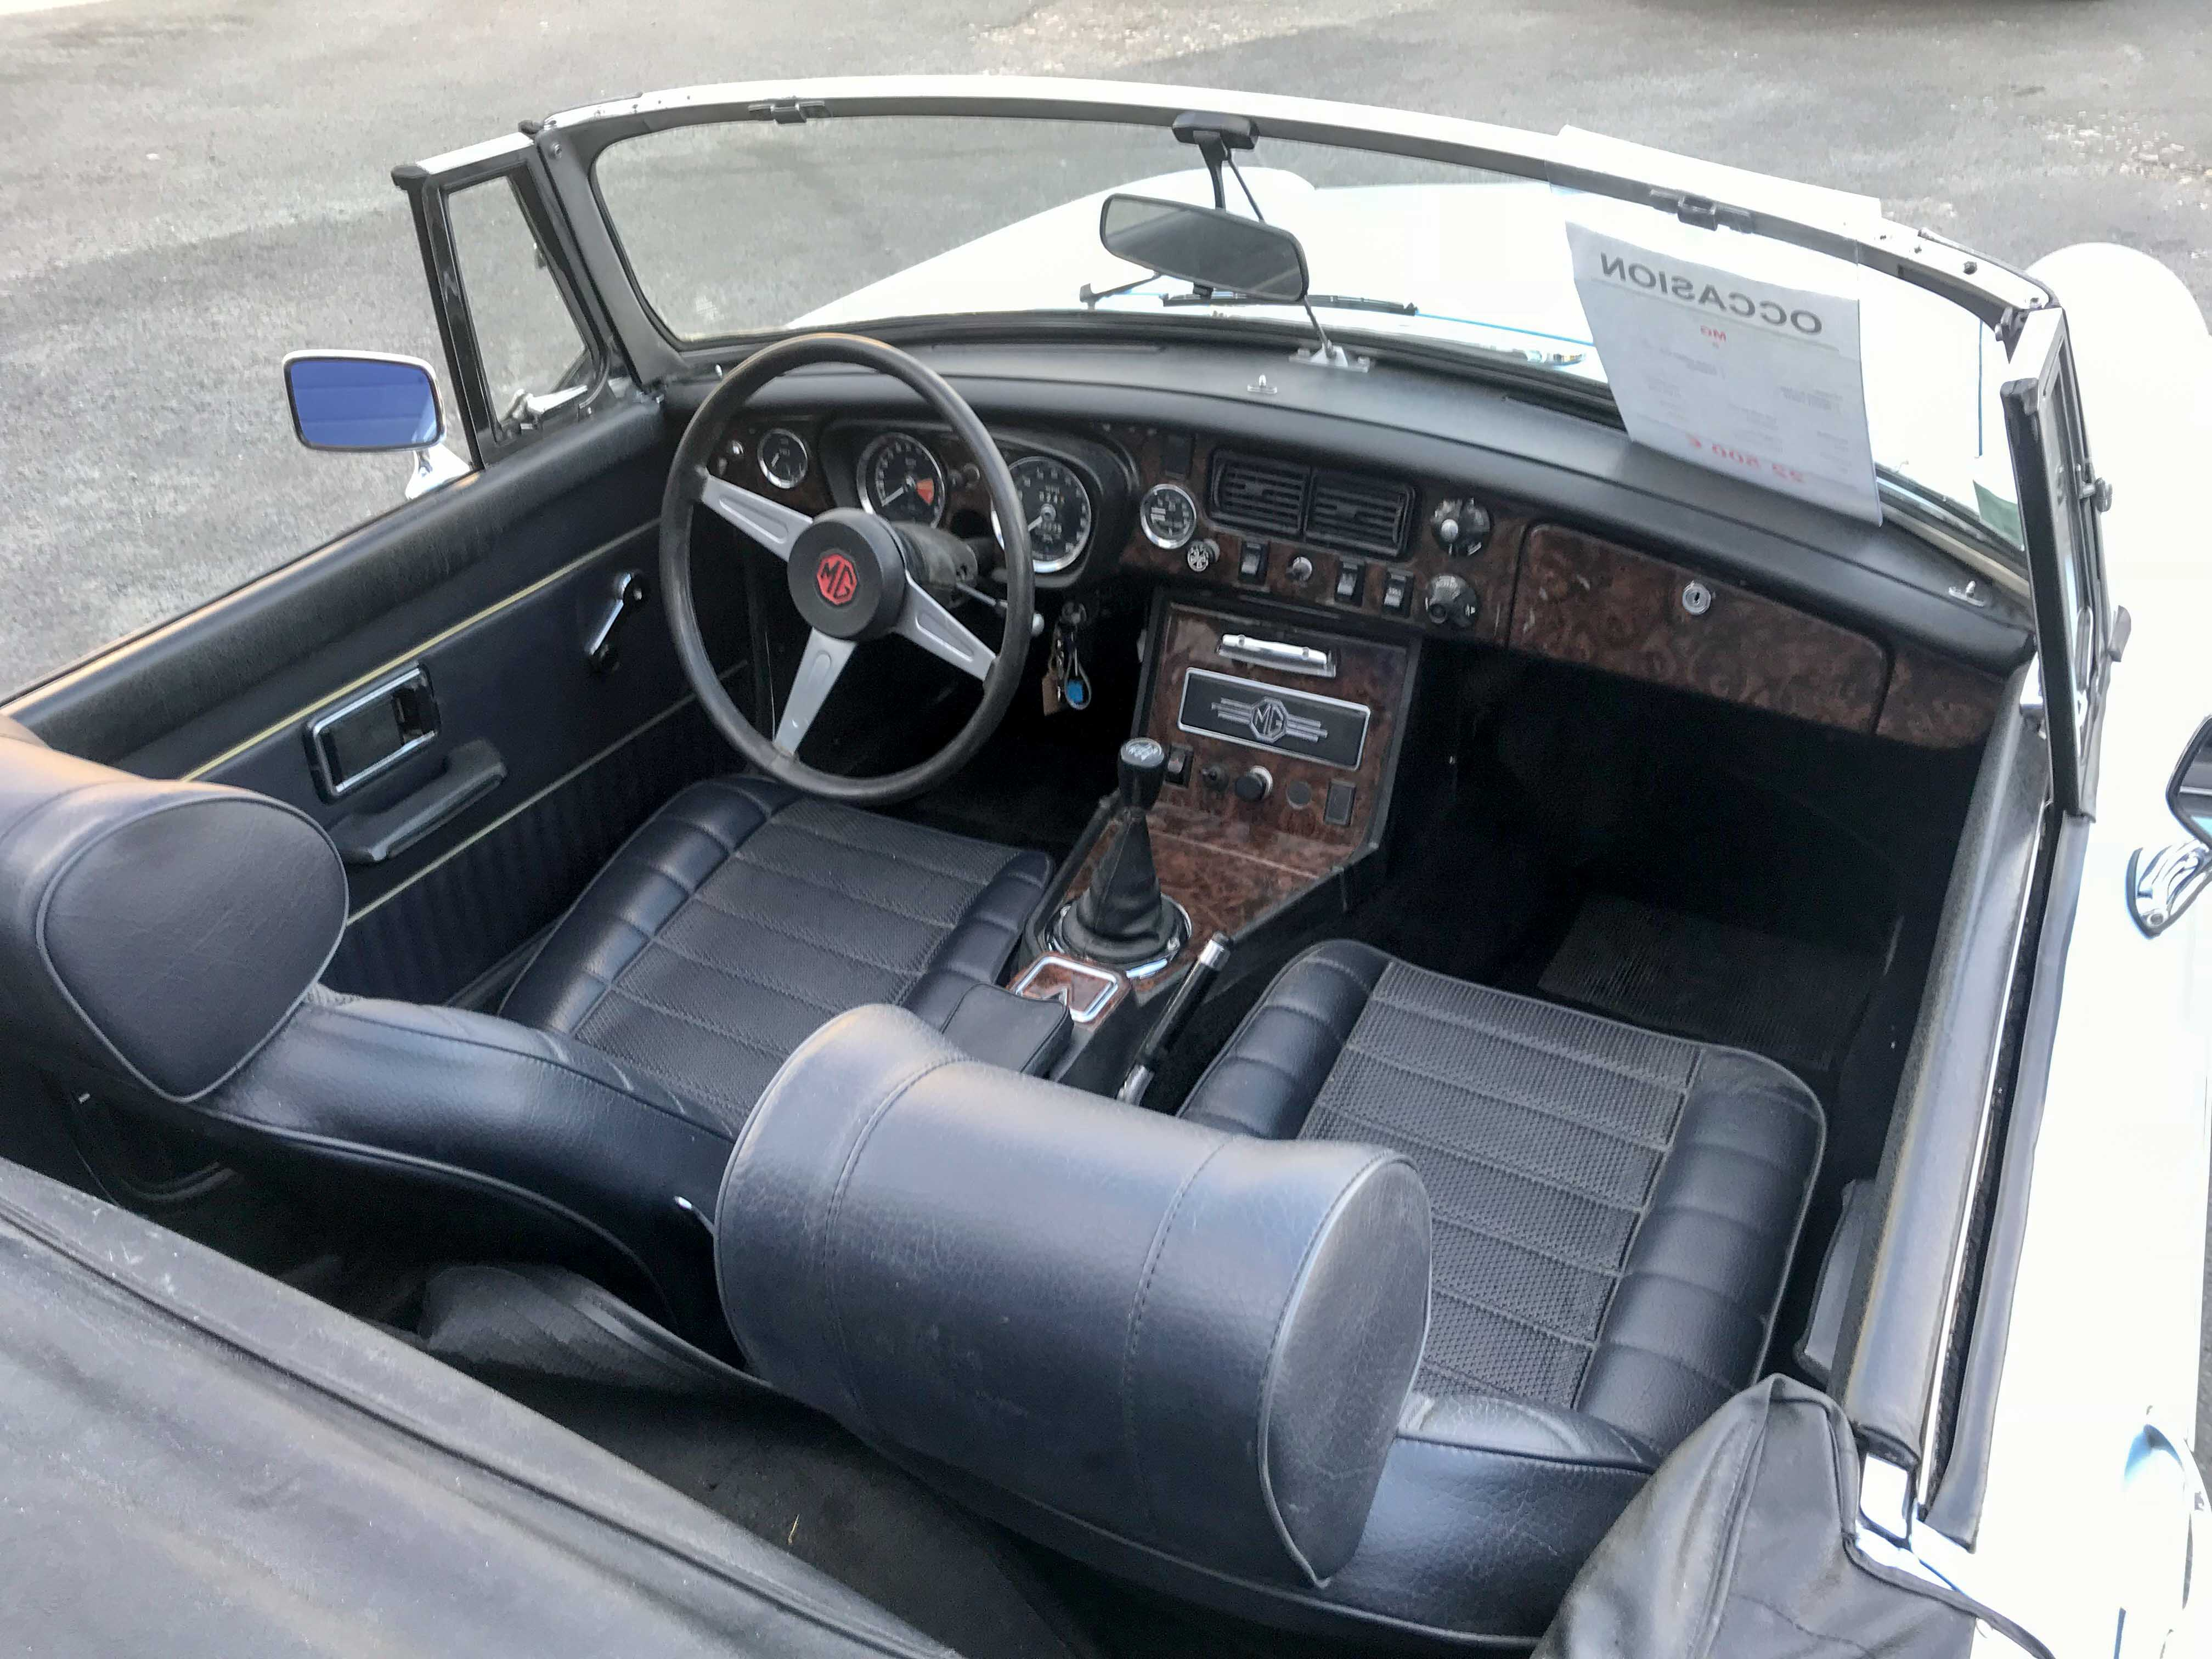 v hicules archive clart automobilesclart automobiles. Black Bedroom Furniture Sets. Home Design Ideas